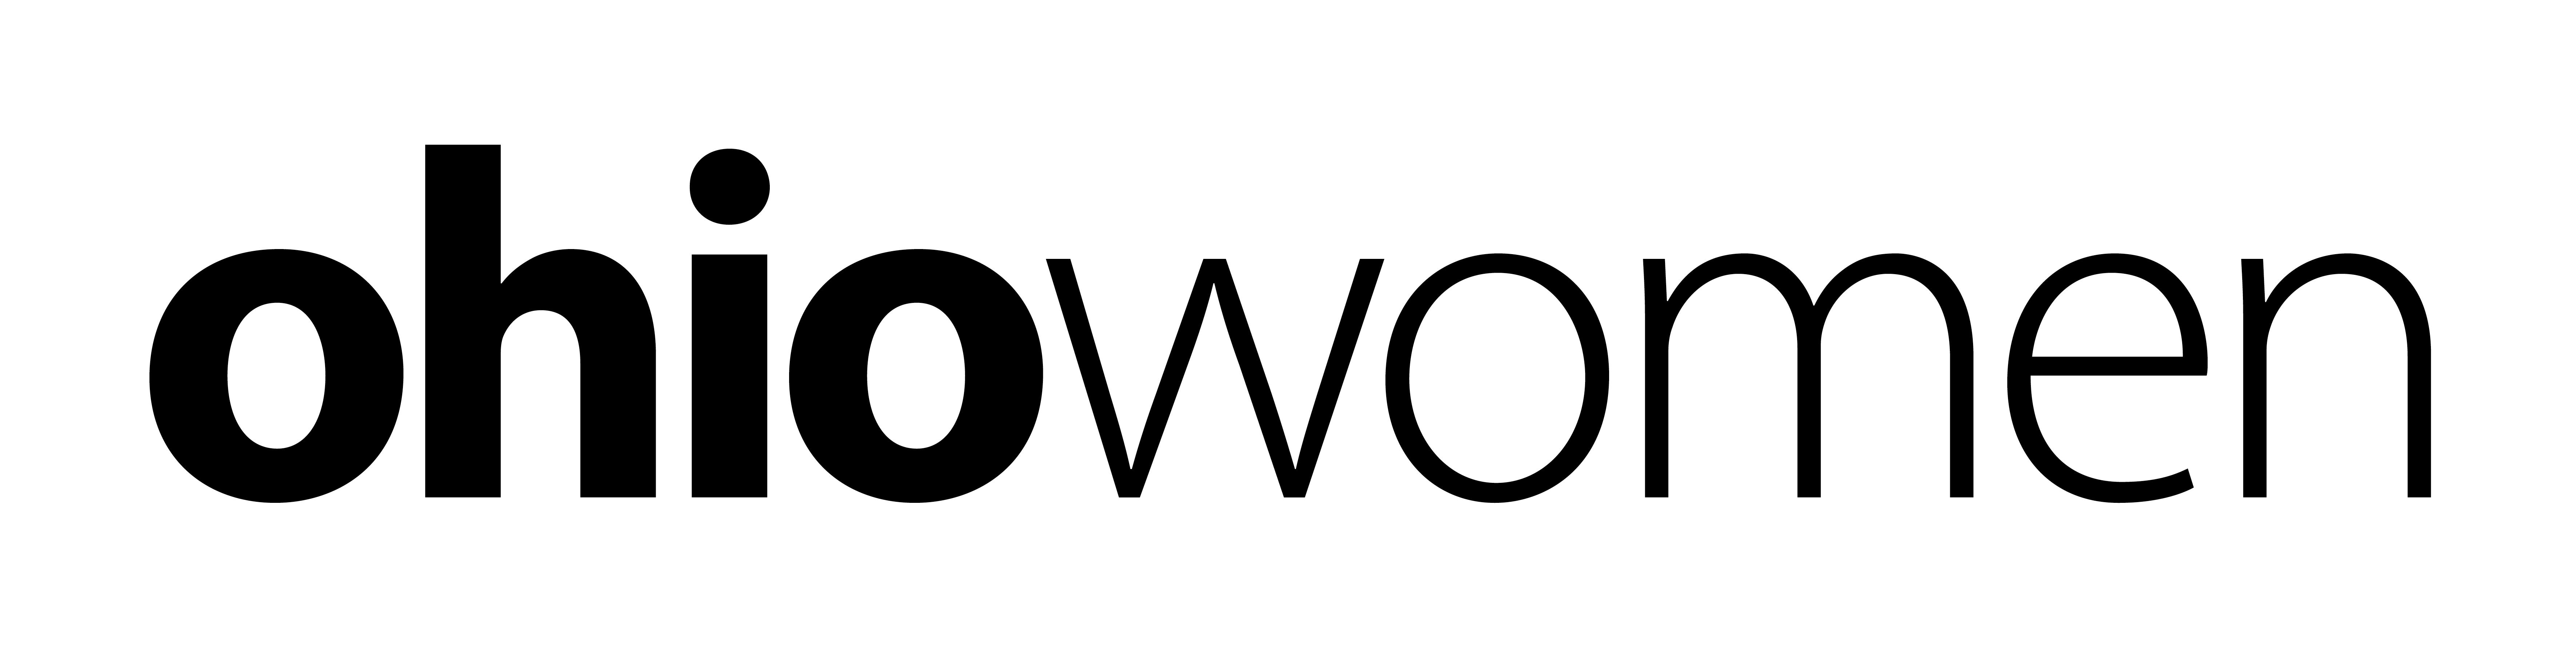 ohiowoman-logo.jpg